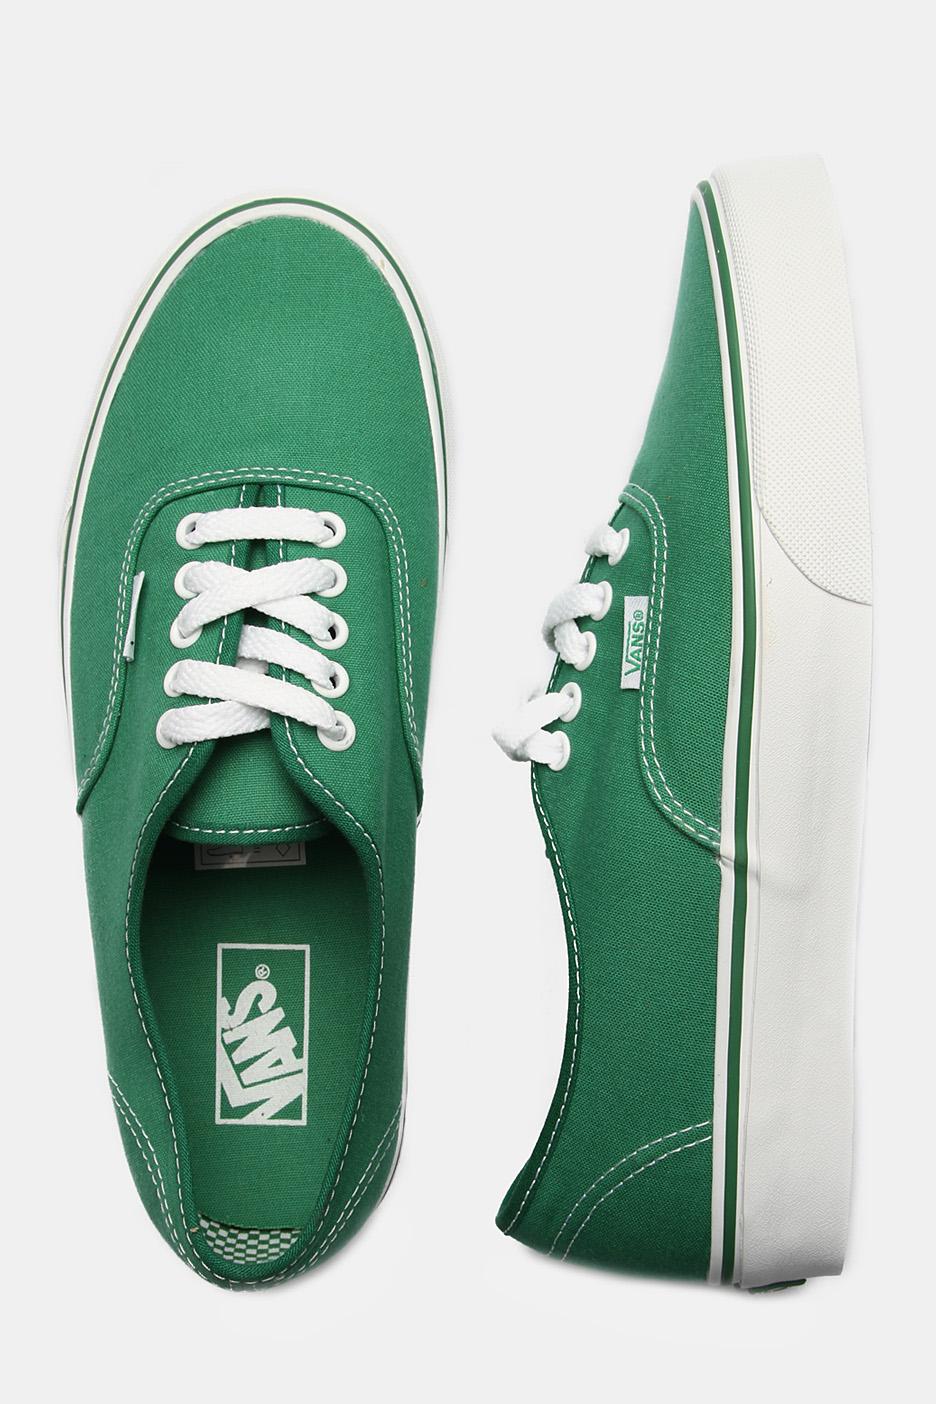 vans shoes green